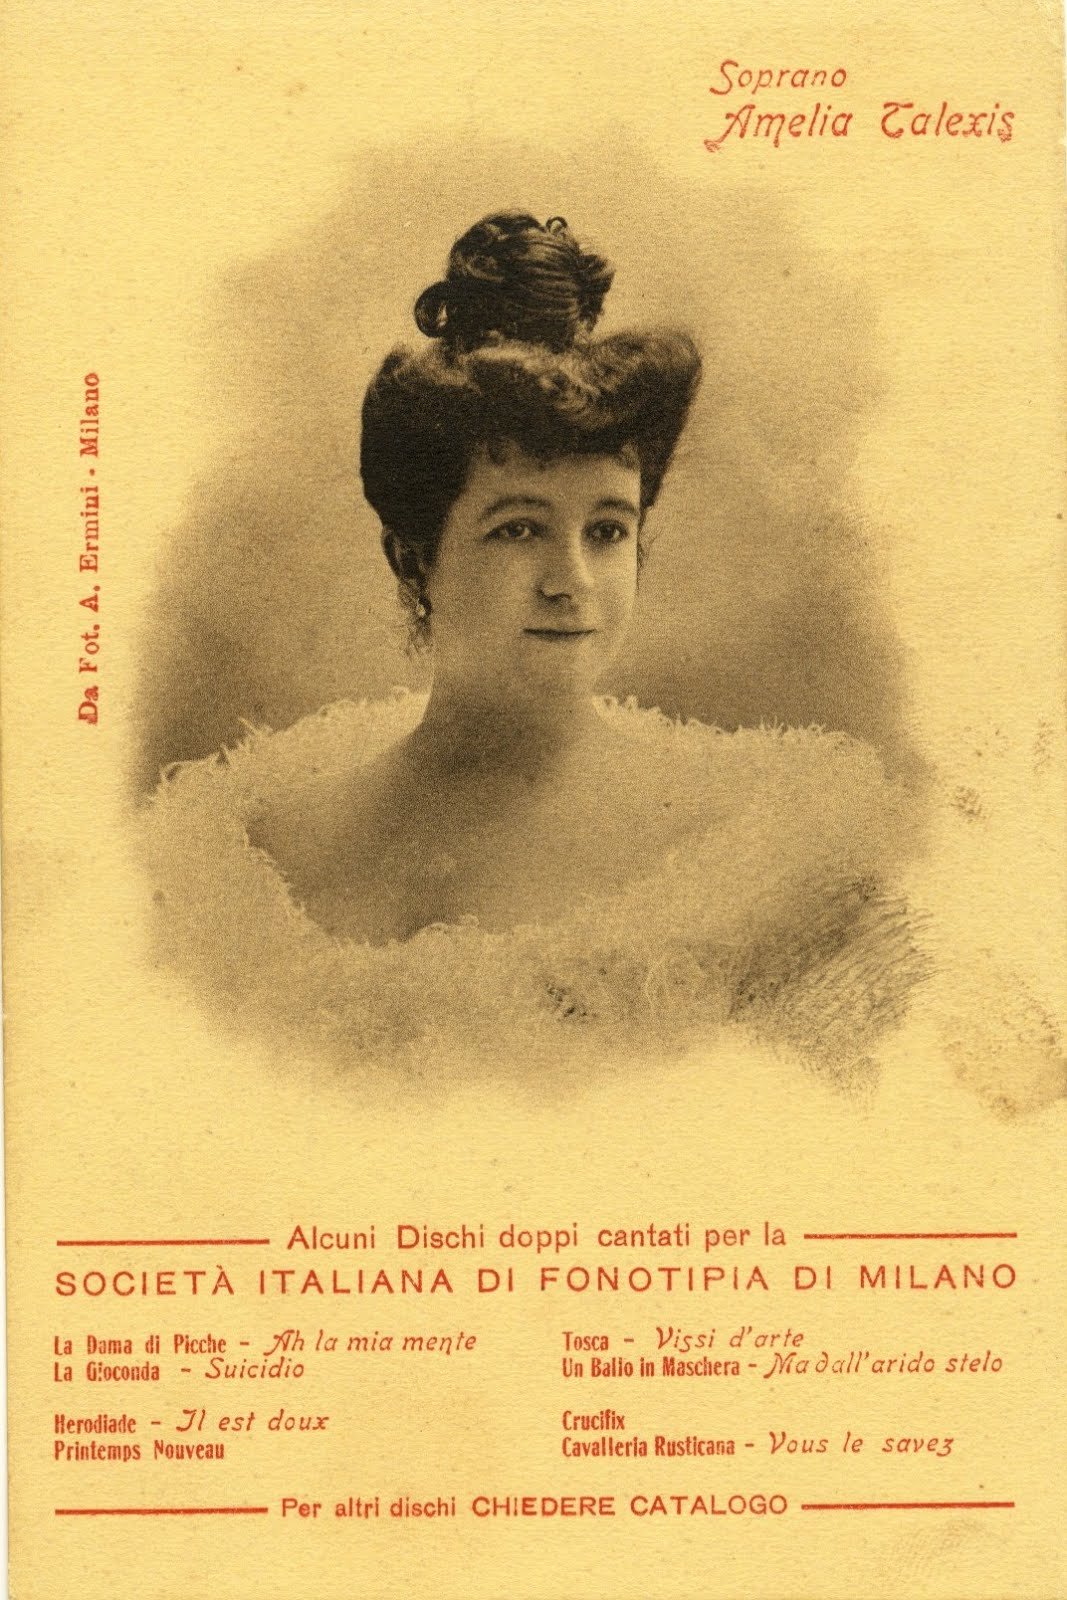 GREAT FRENCH SOPRANO AMELIA TALEXIS (1875 1911) CD